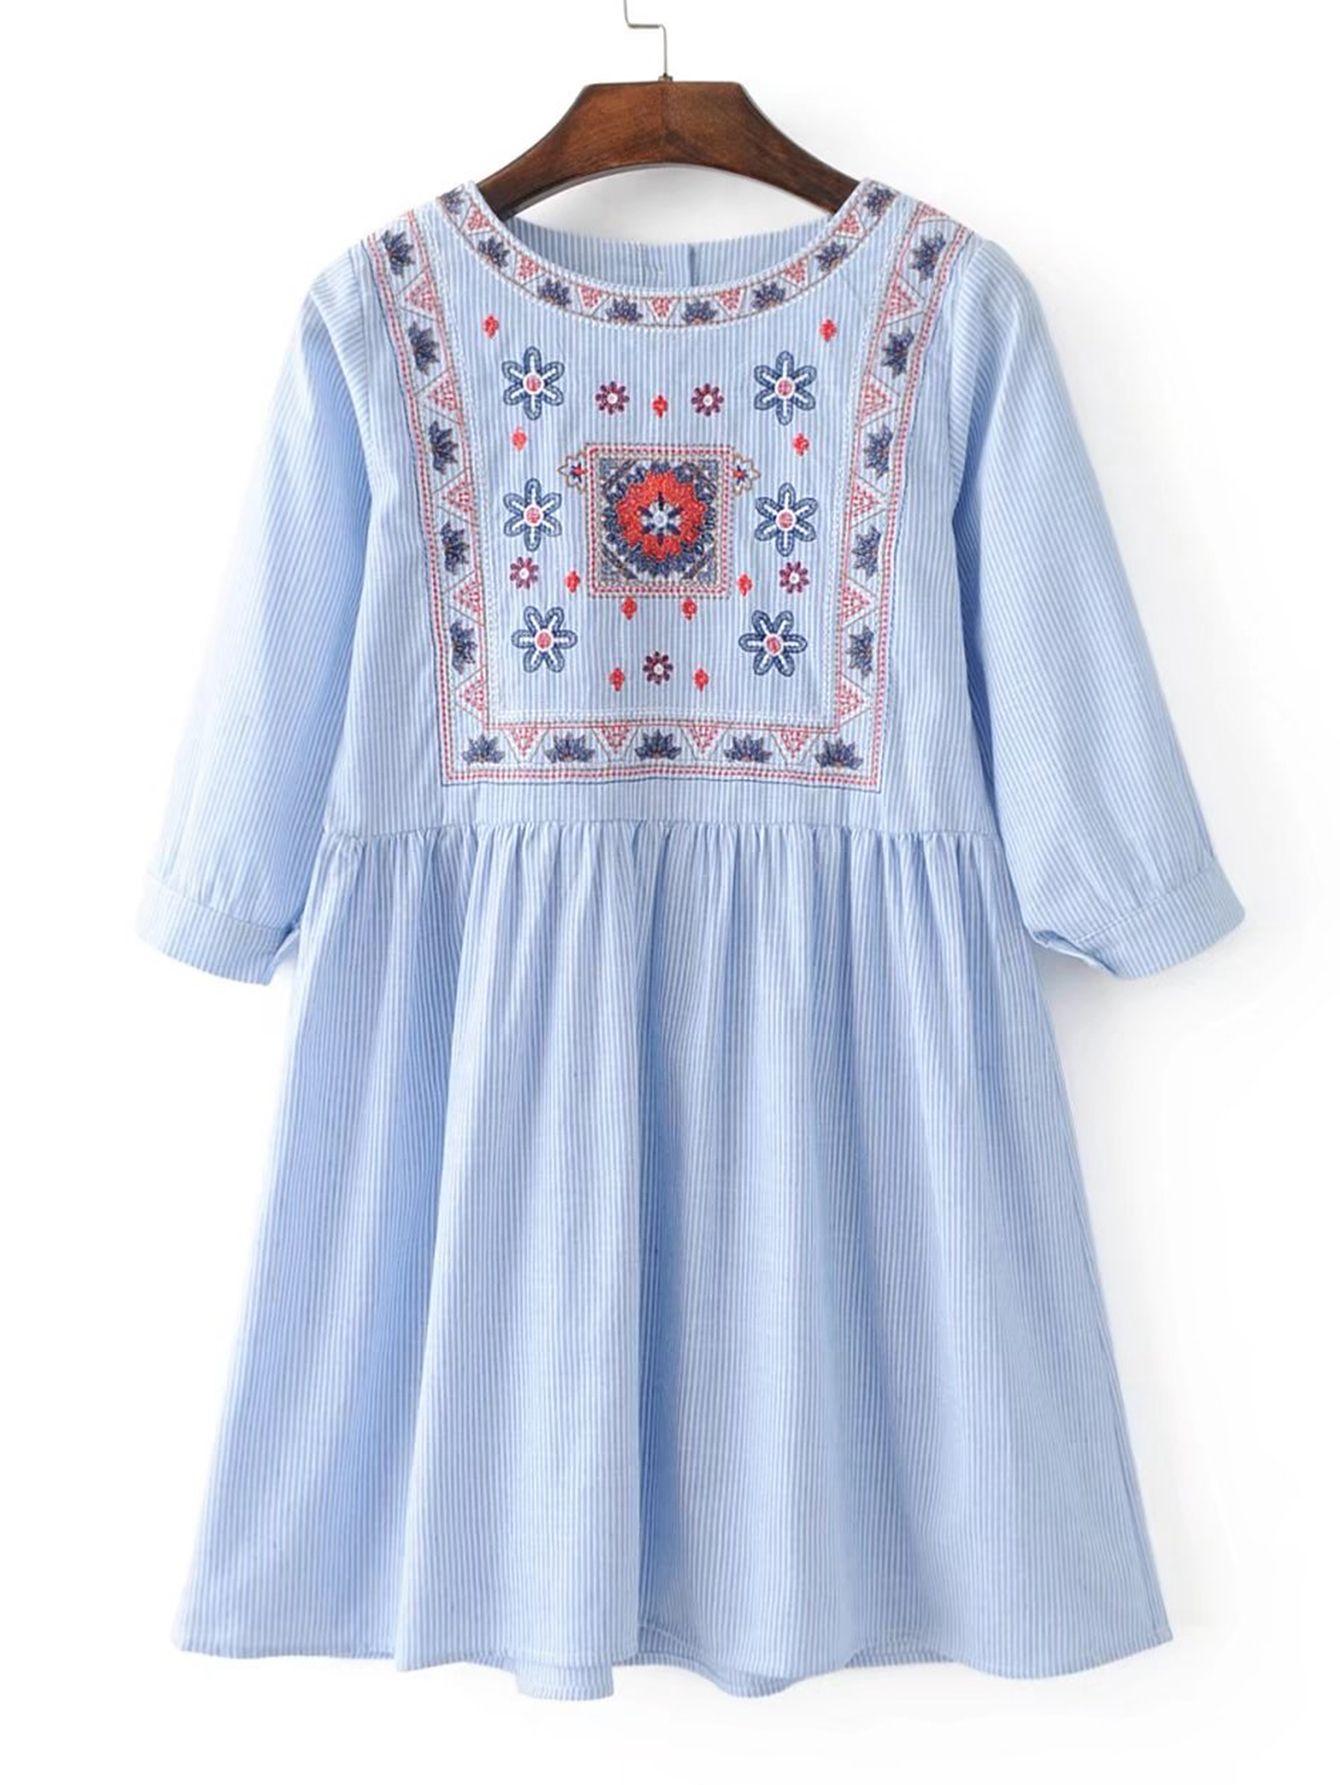 Shop 3 4 Sleeve Pinstripe Shift Dress Online Shein Offers 3 4 Sleeve Pinstripe Shift Dress More T Shirt Dress Casual Casual Summer Dresses Casual Wear Dress [ 1785 x 1340 Pixel ]